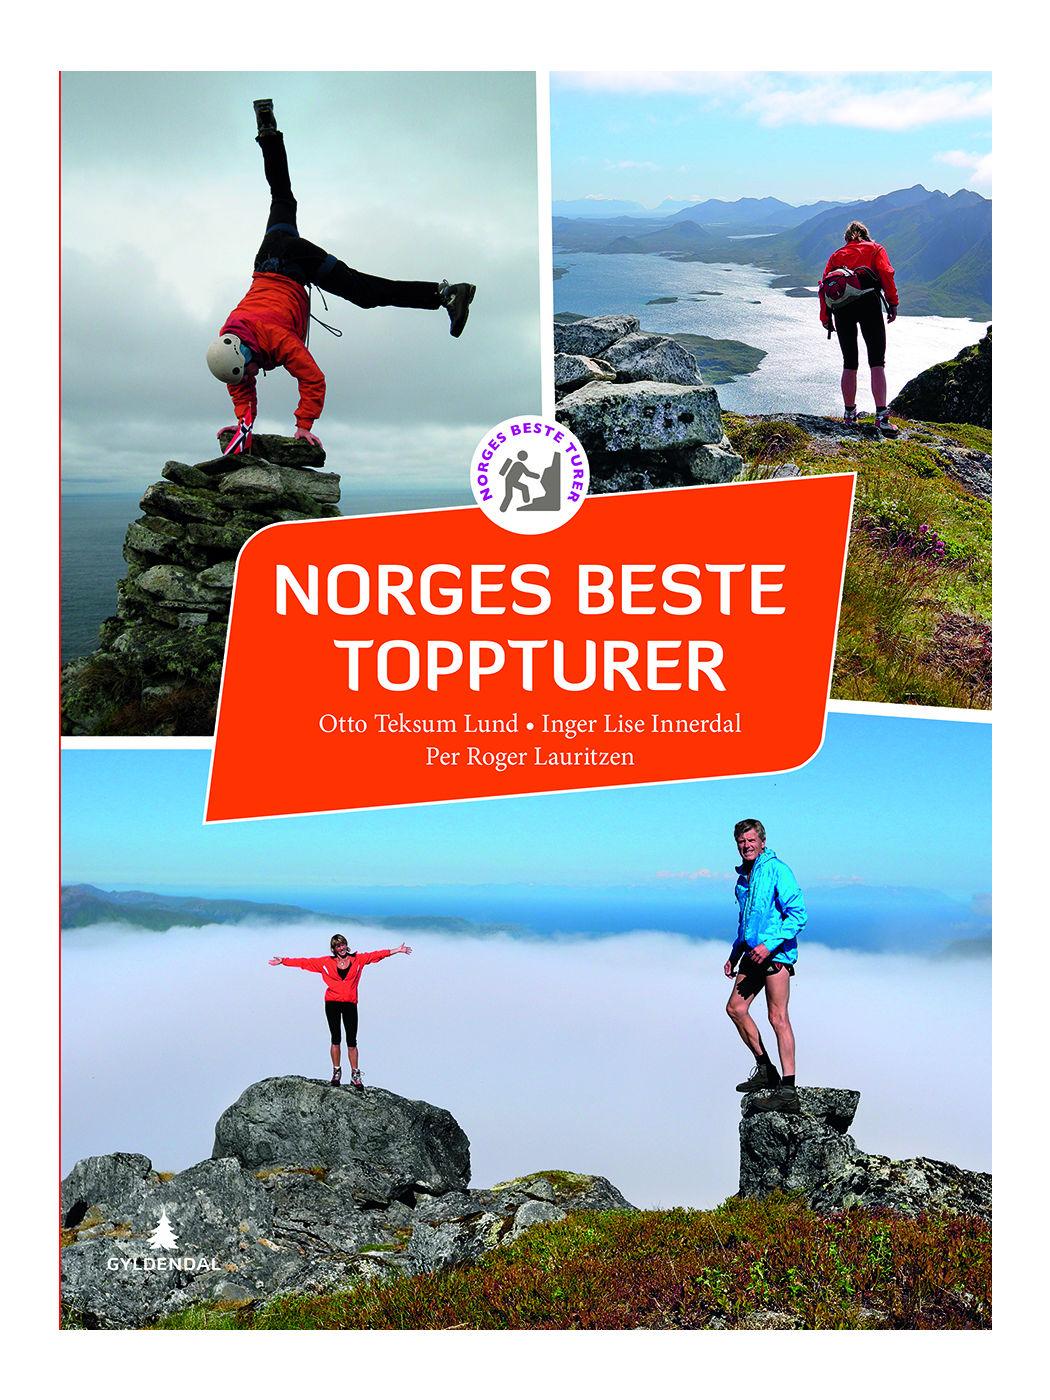 Norges-beste-toppturer_Fotokreditering-Gyldendal2